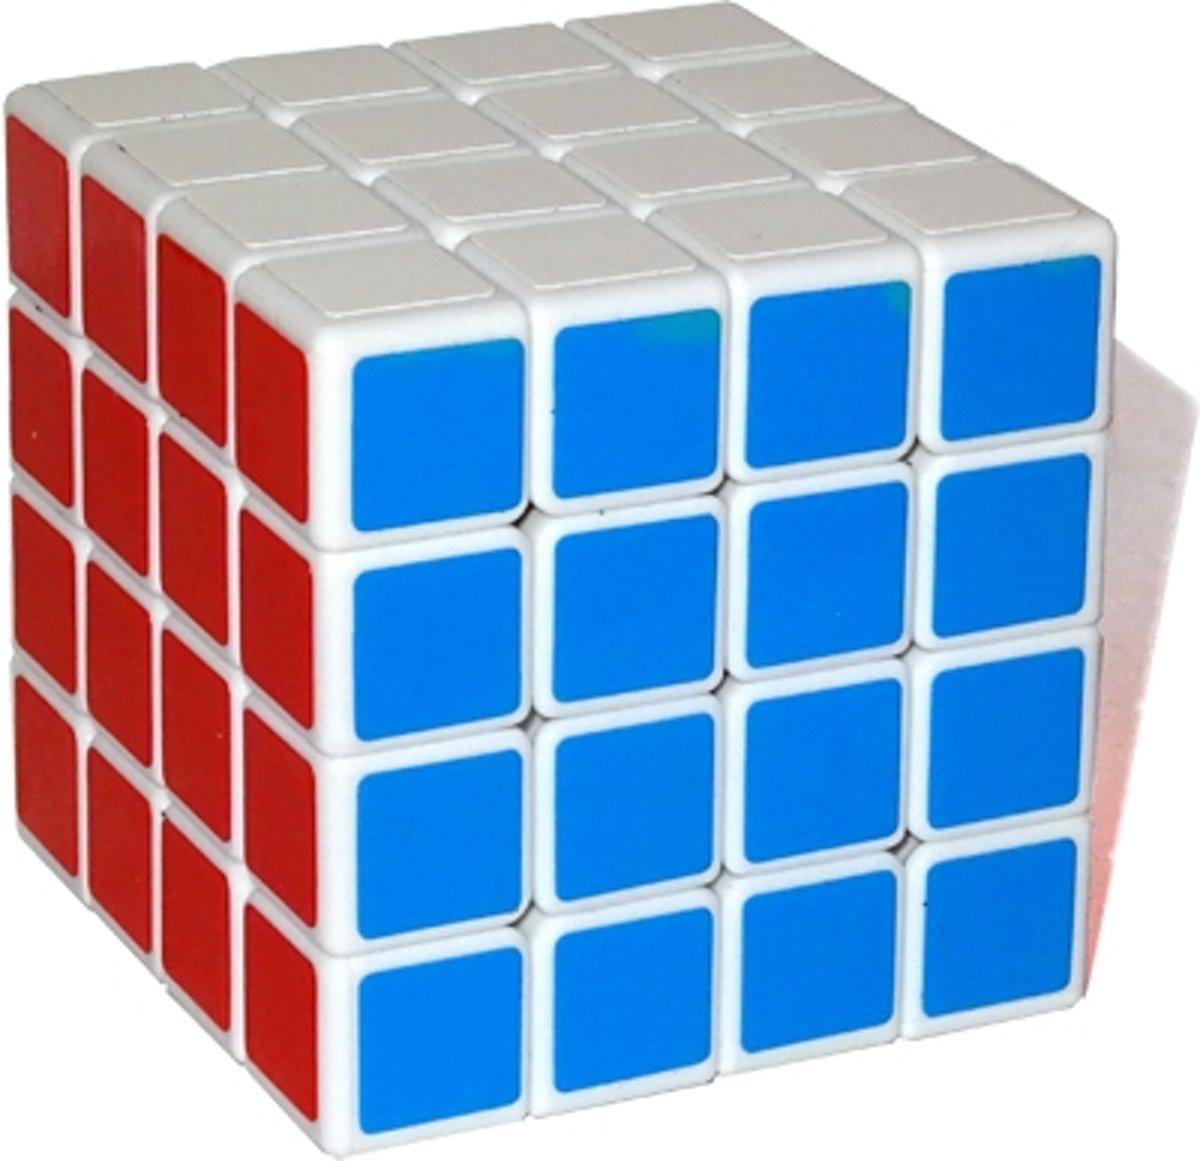 Shengshou 4x4x4 cube - Witte kubus - incl. gratis verzenden